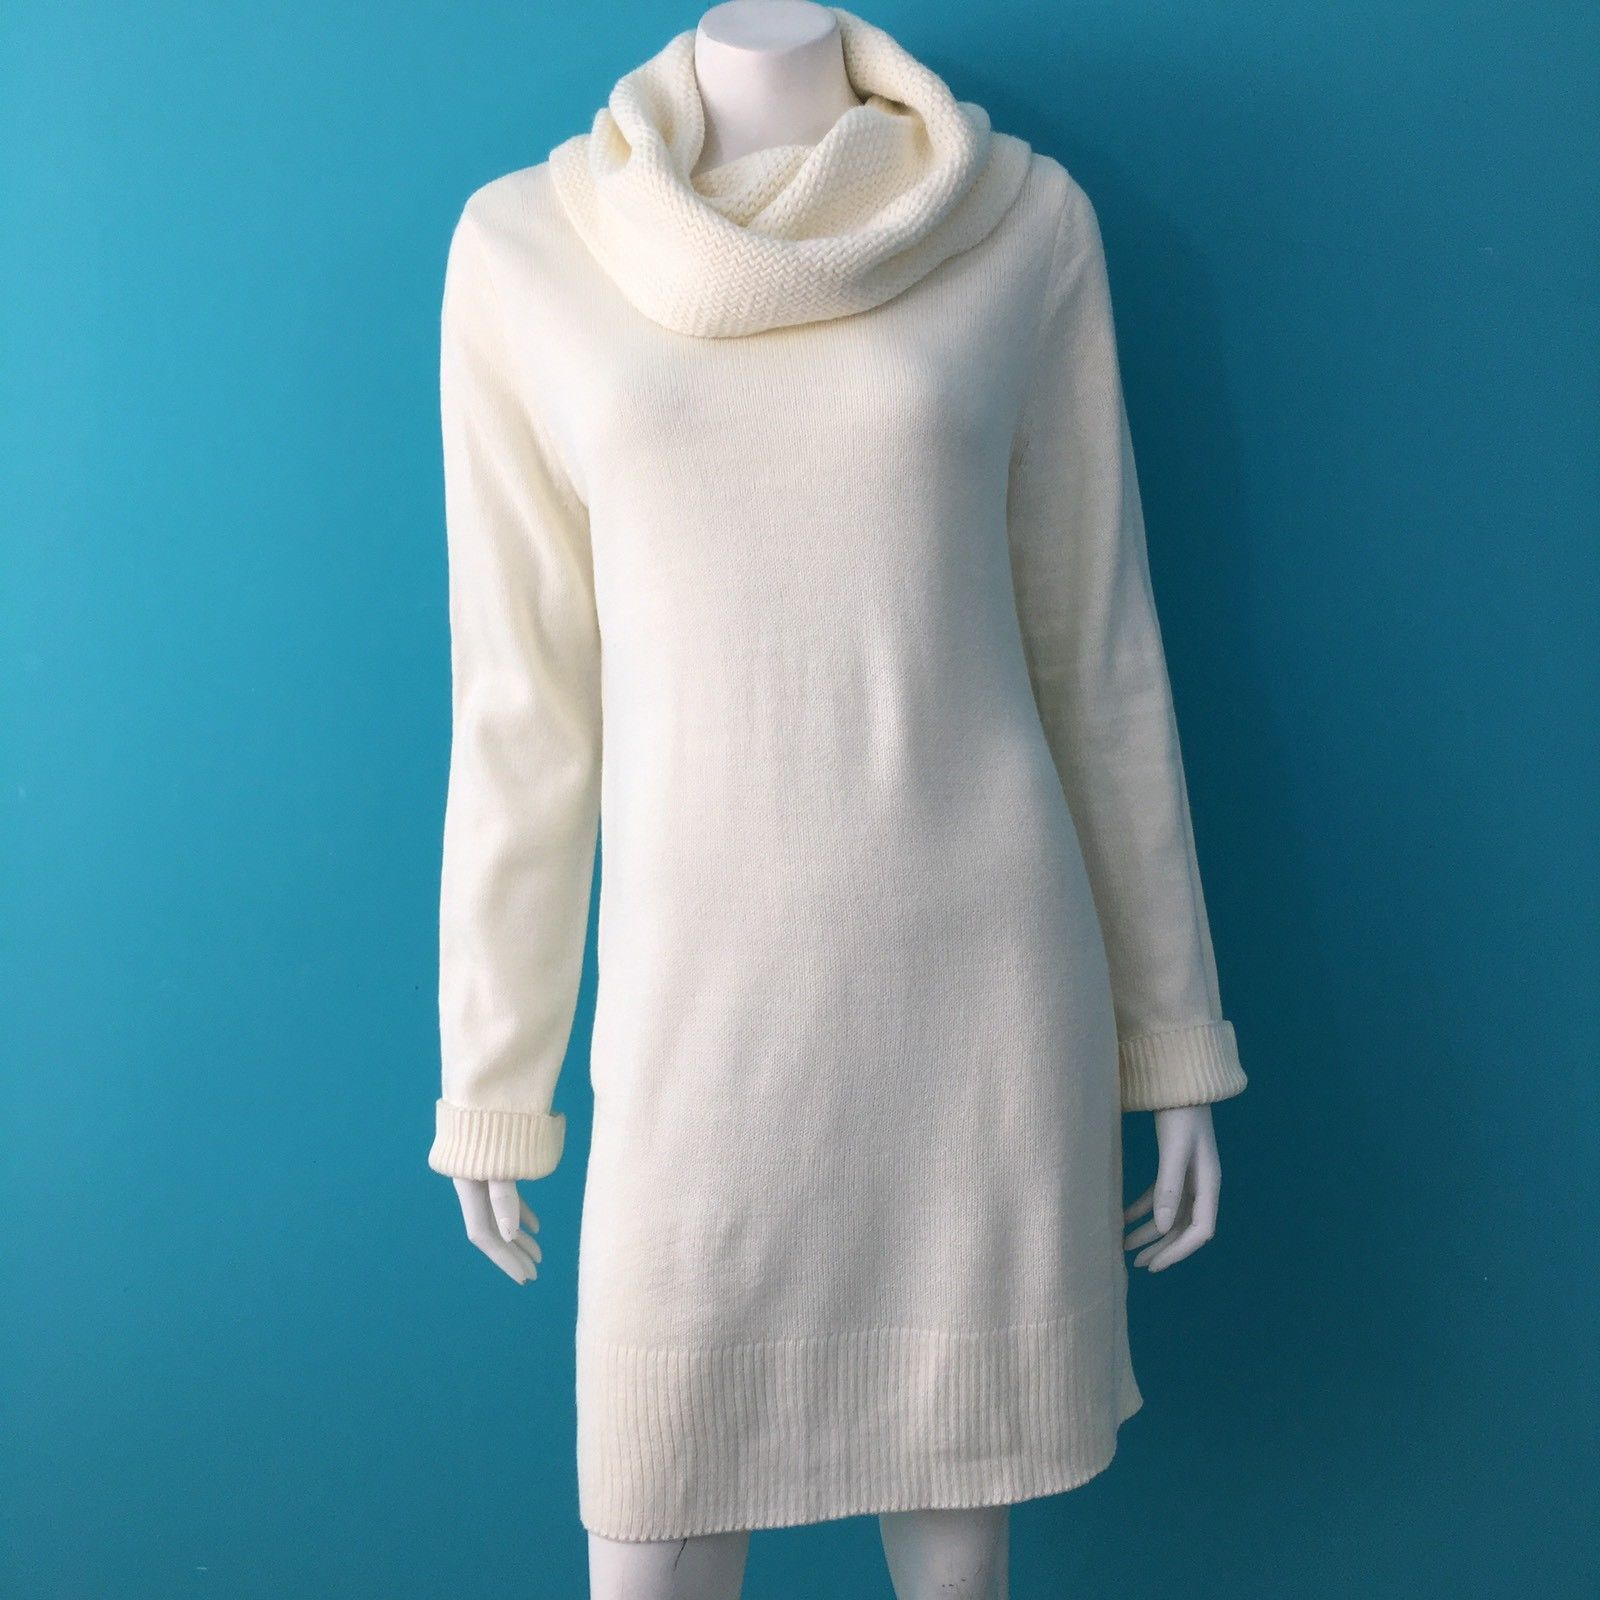 836c2fbd97d Cool Amazing H M Womens Long Sleeve Cowl Neck Sweater Dress Cream .